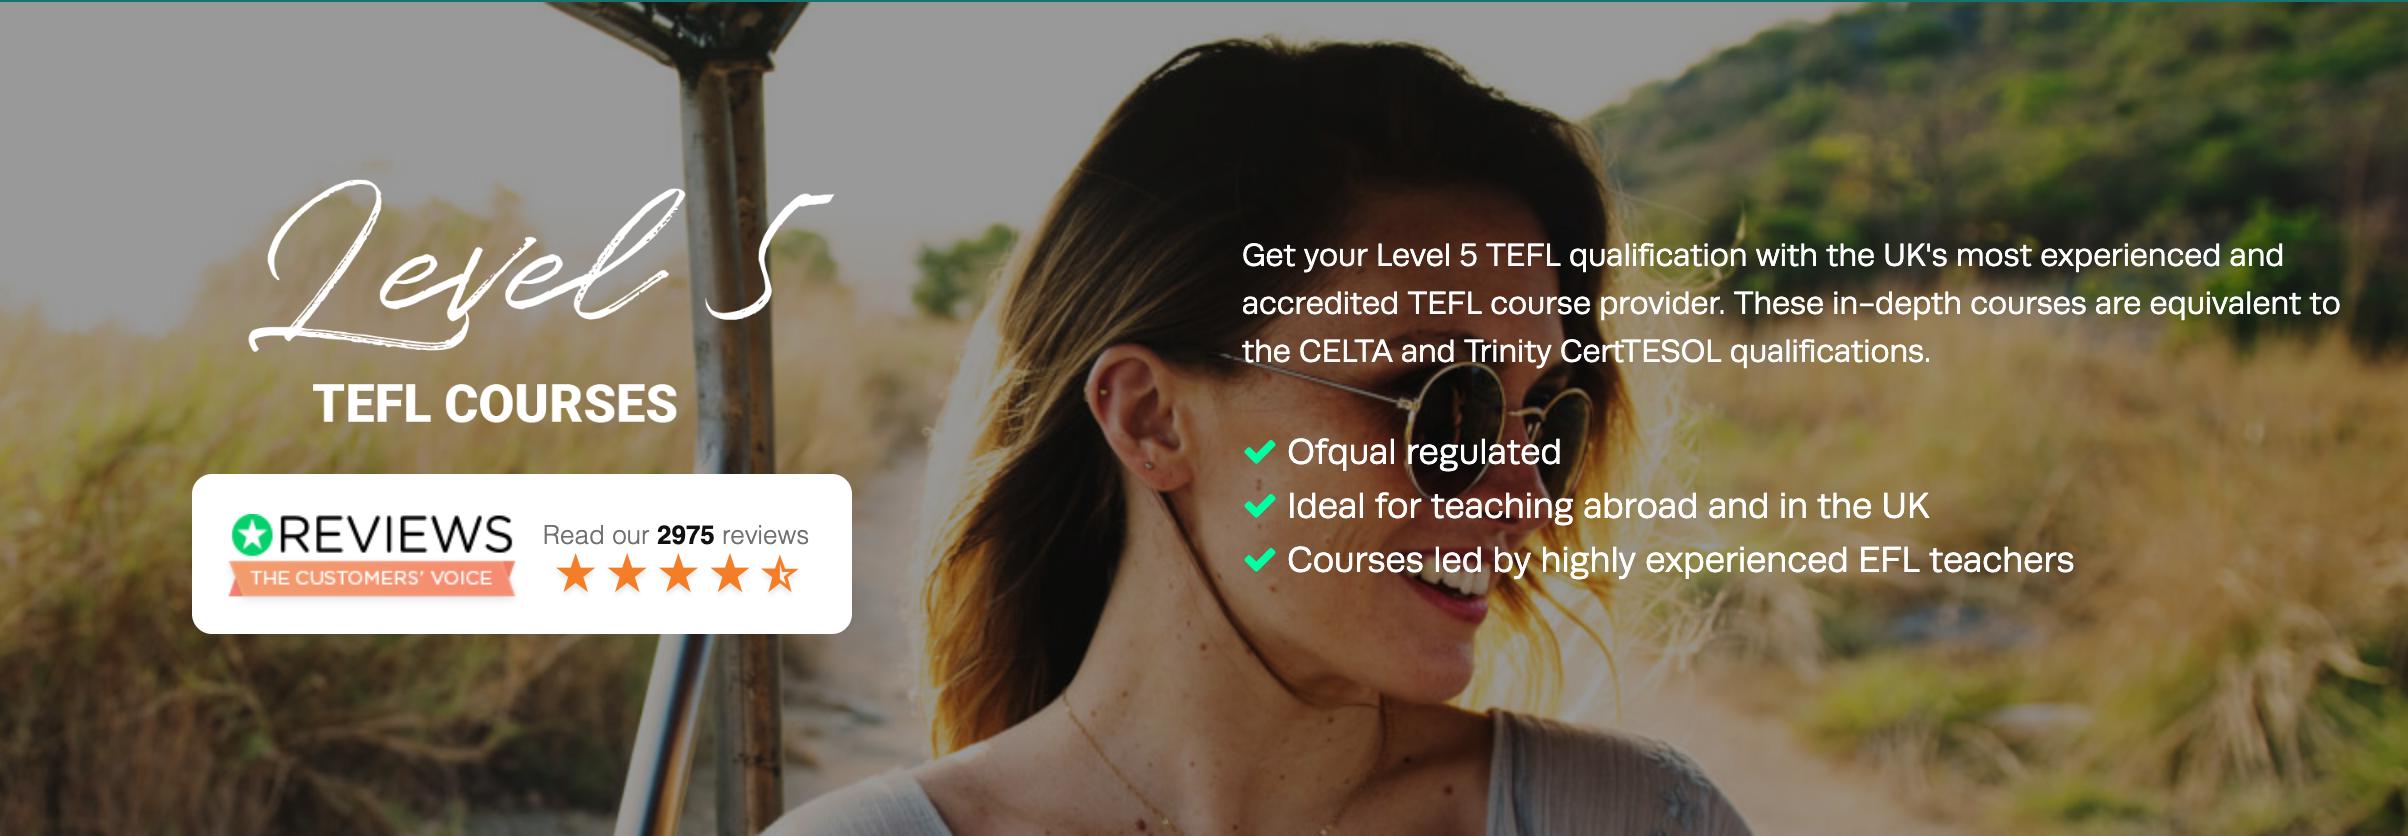 Level 5 TEFL Courses- tefl.org